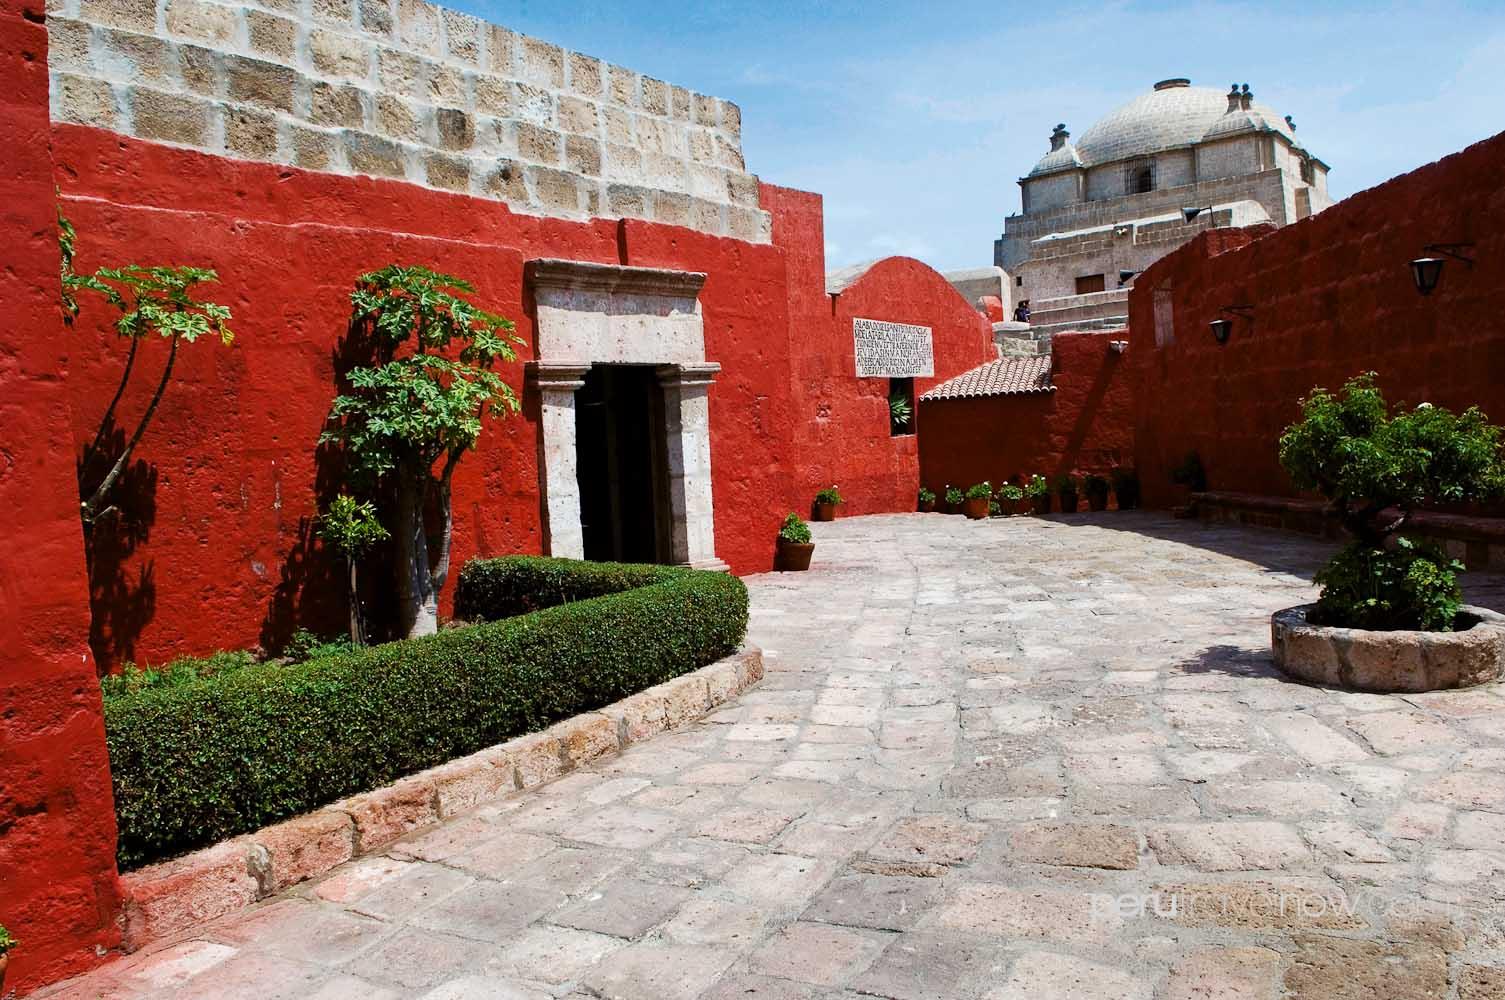 Monasterio de Santa Catalina. Foto: ttnotes.com